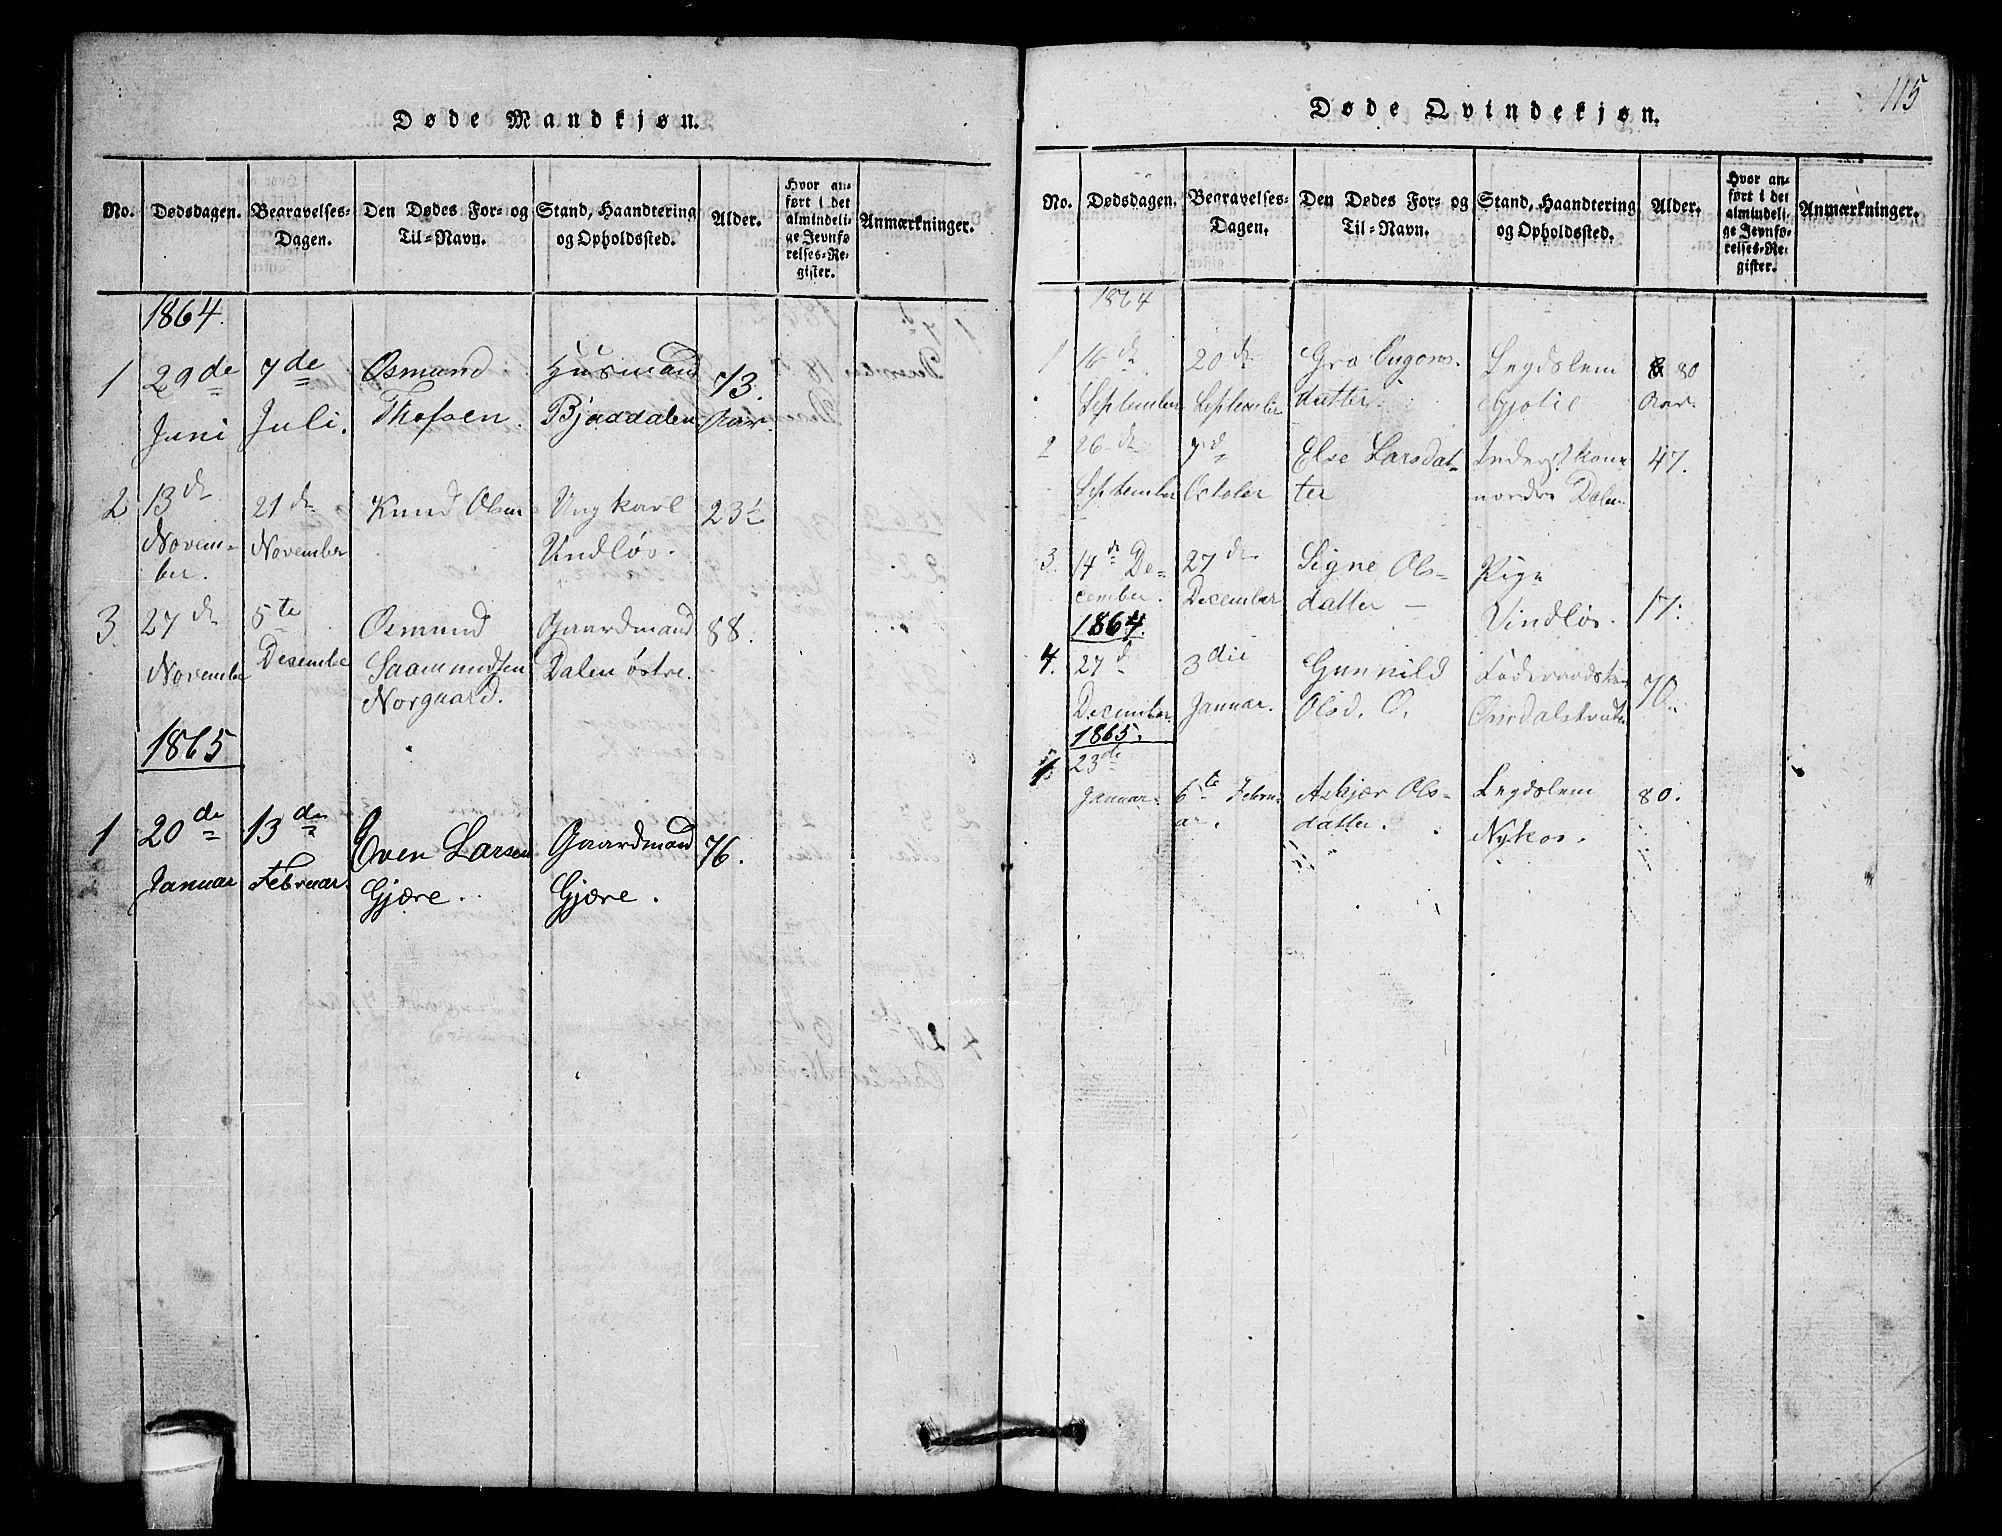 SAKO, Lårdal kirkebøker, G/Gb/L0001: Klokkerbok nr. II 1, 1815-1865, s. 115